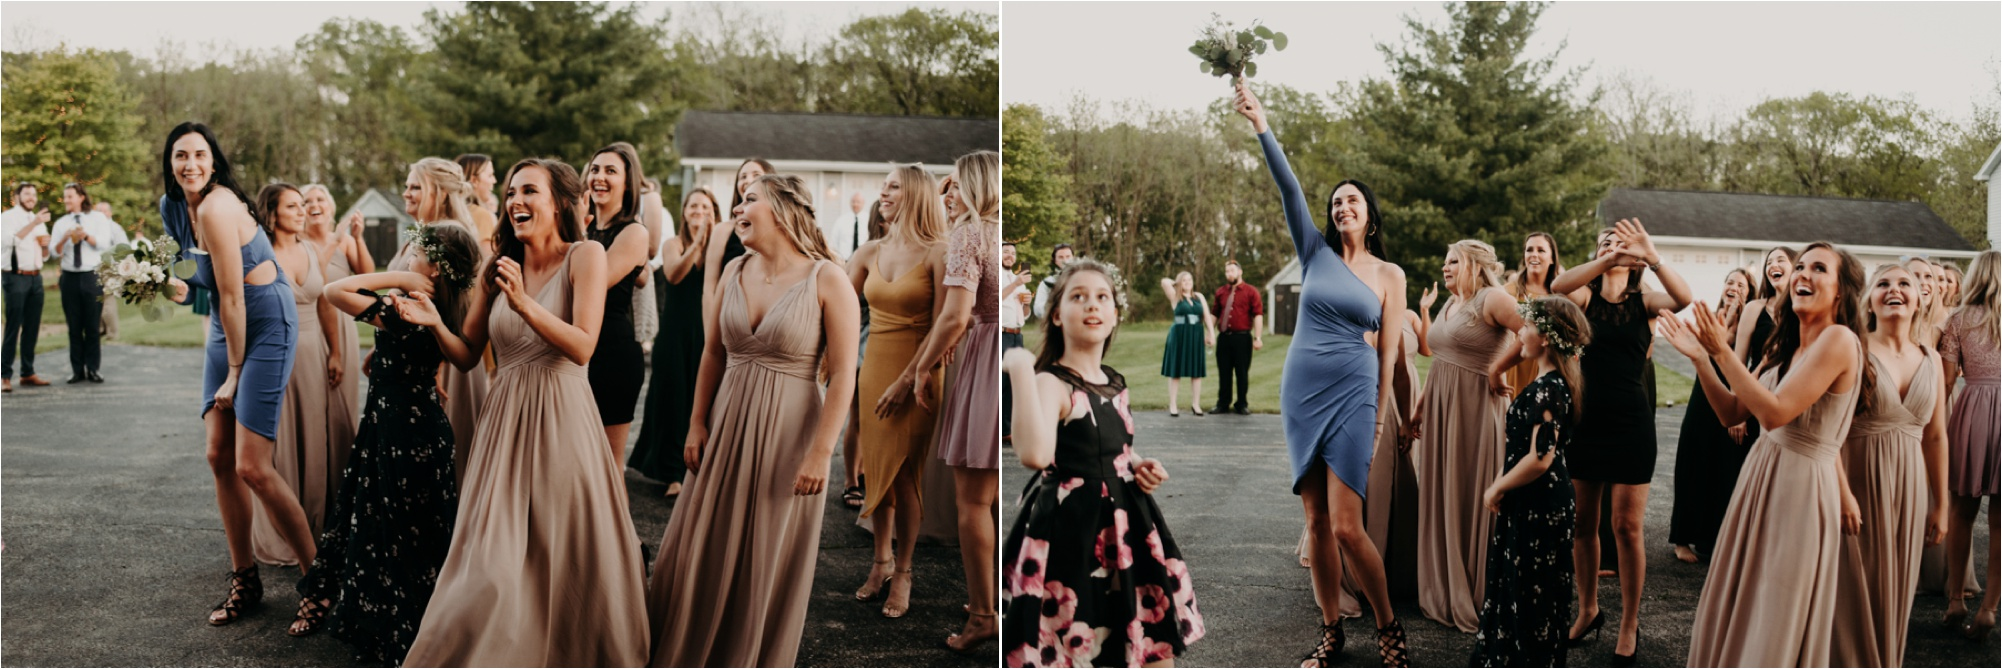 The Barn and Black Ridge Wedding Minneapolis Wedding Photographer_4181.jpg